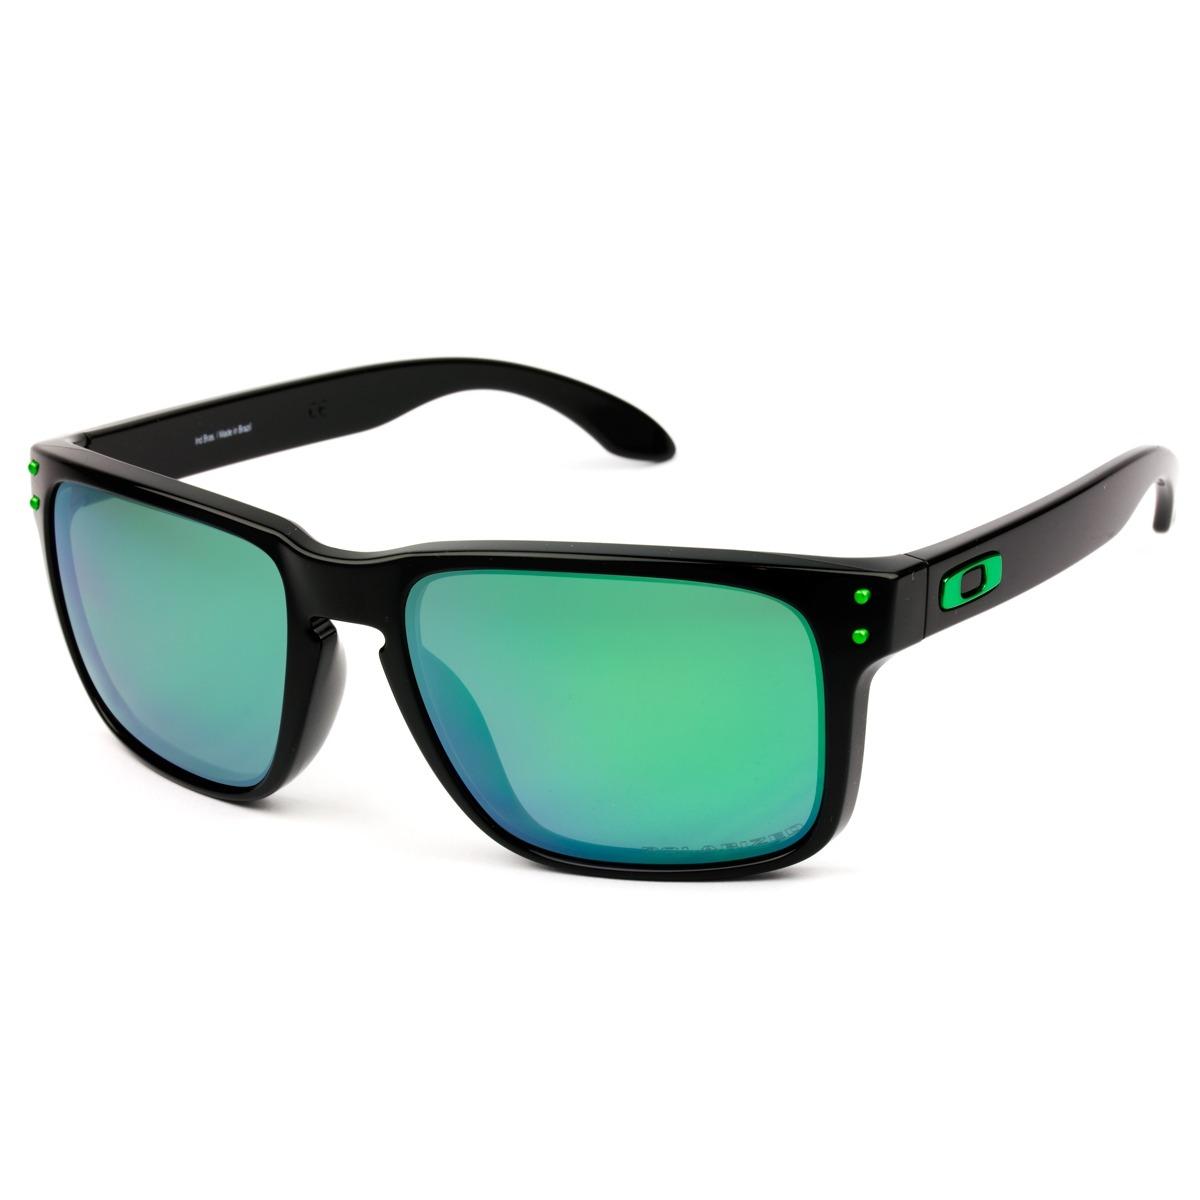 4ace9ef8f8b98 óculos oakley holbrook lente verde  9. Carregando zoom.